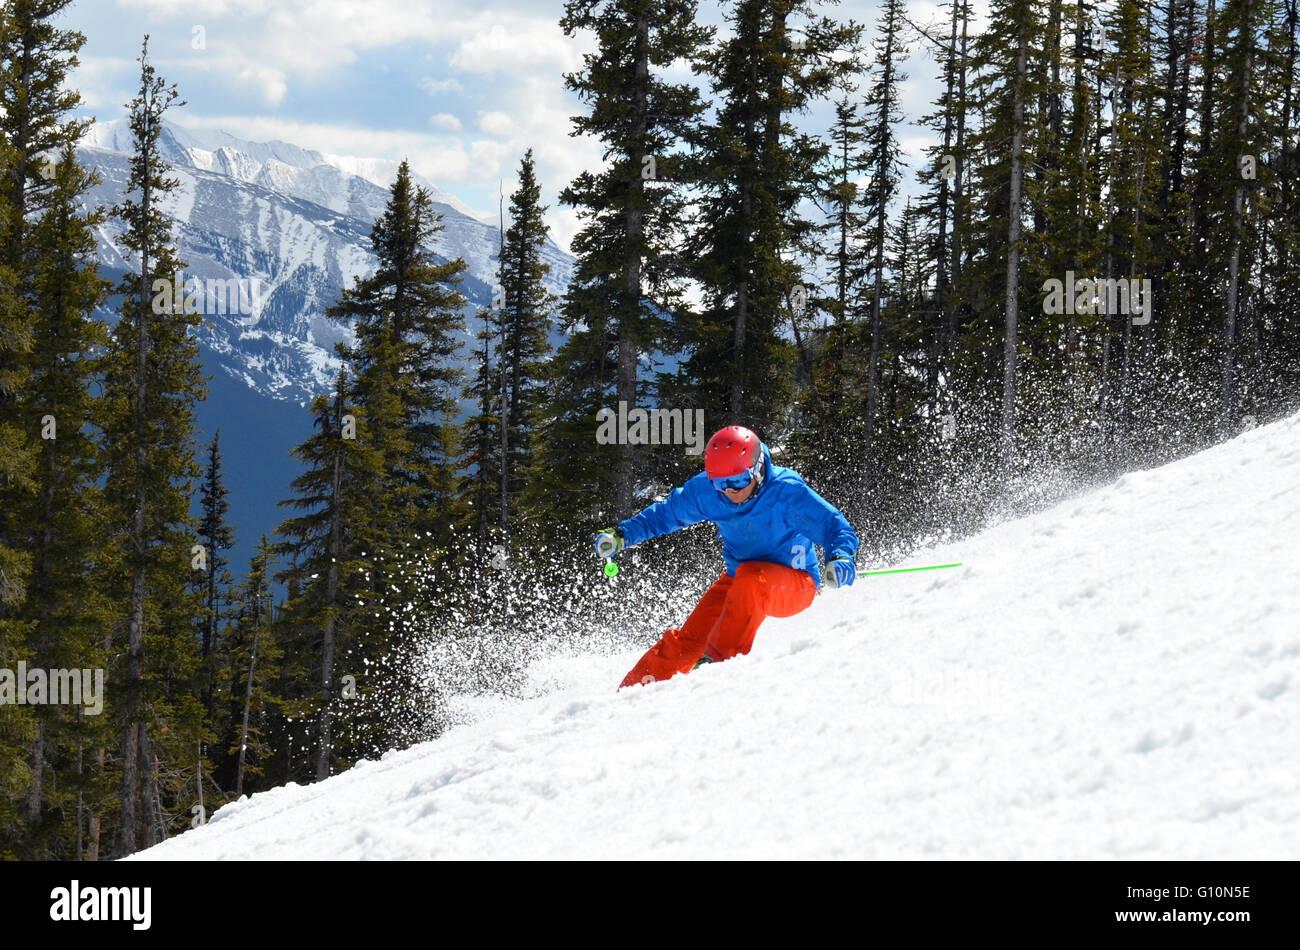 Skiing the Canadian Rockies, Alberta Stock Photo